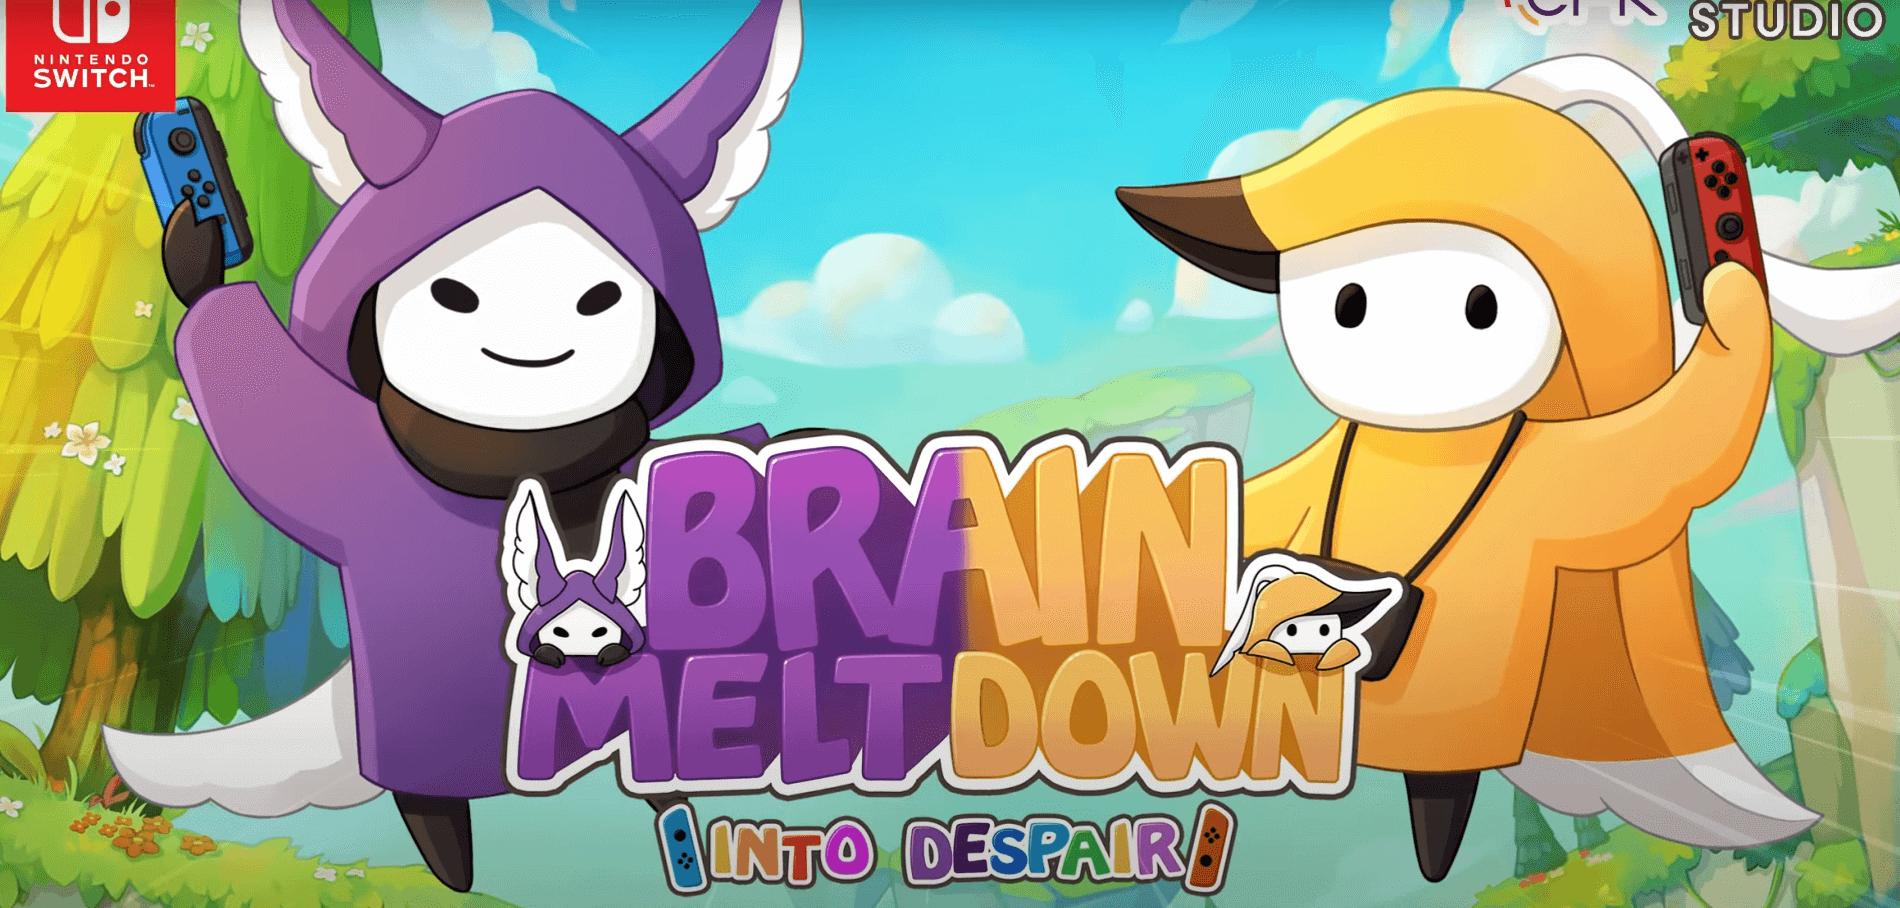 brain meltdown into despair nintendo switch release date